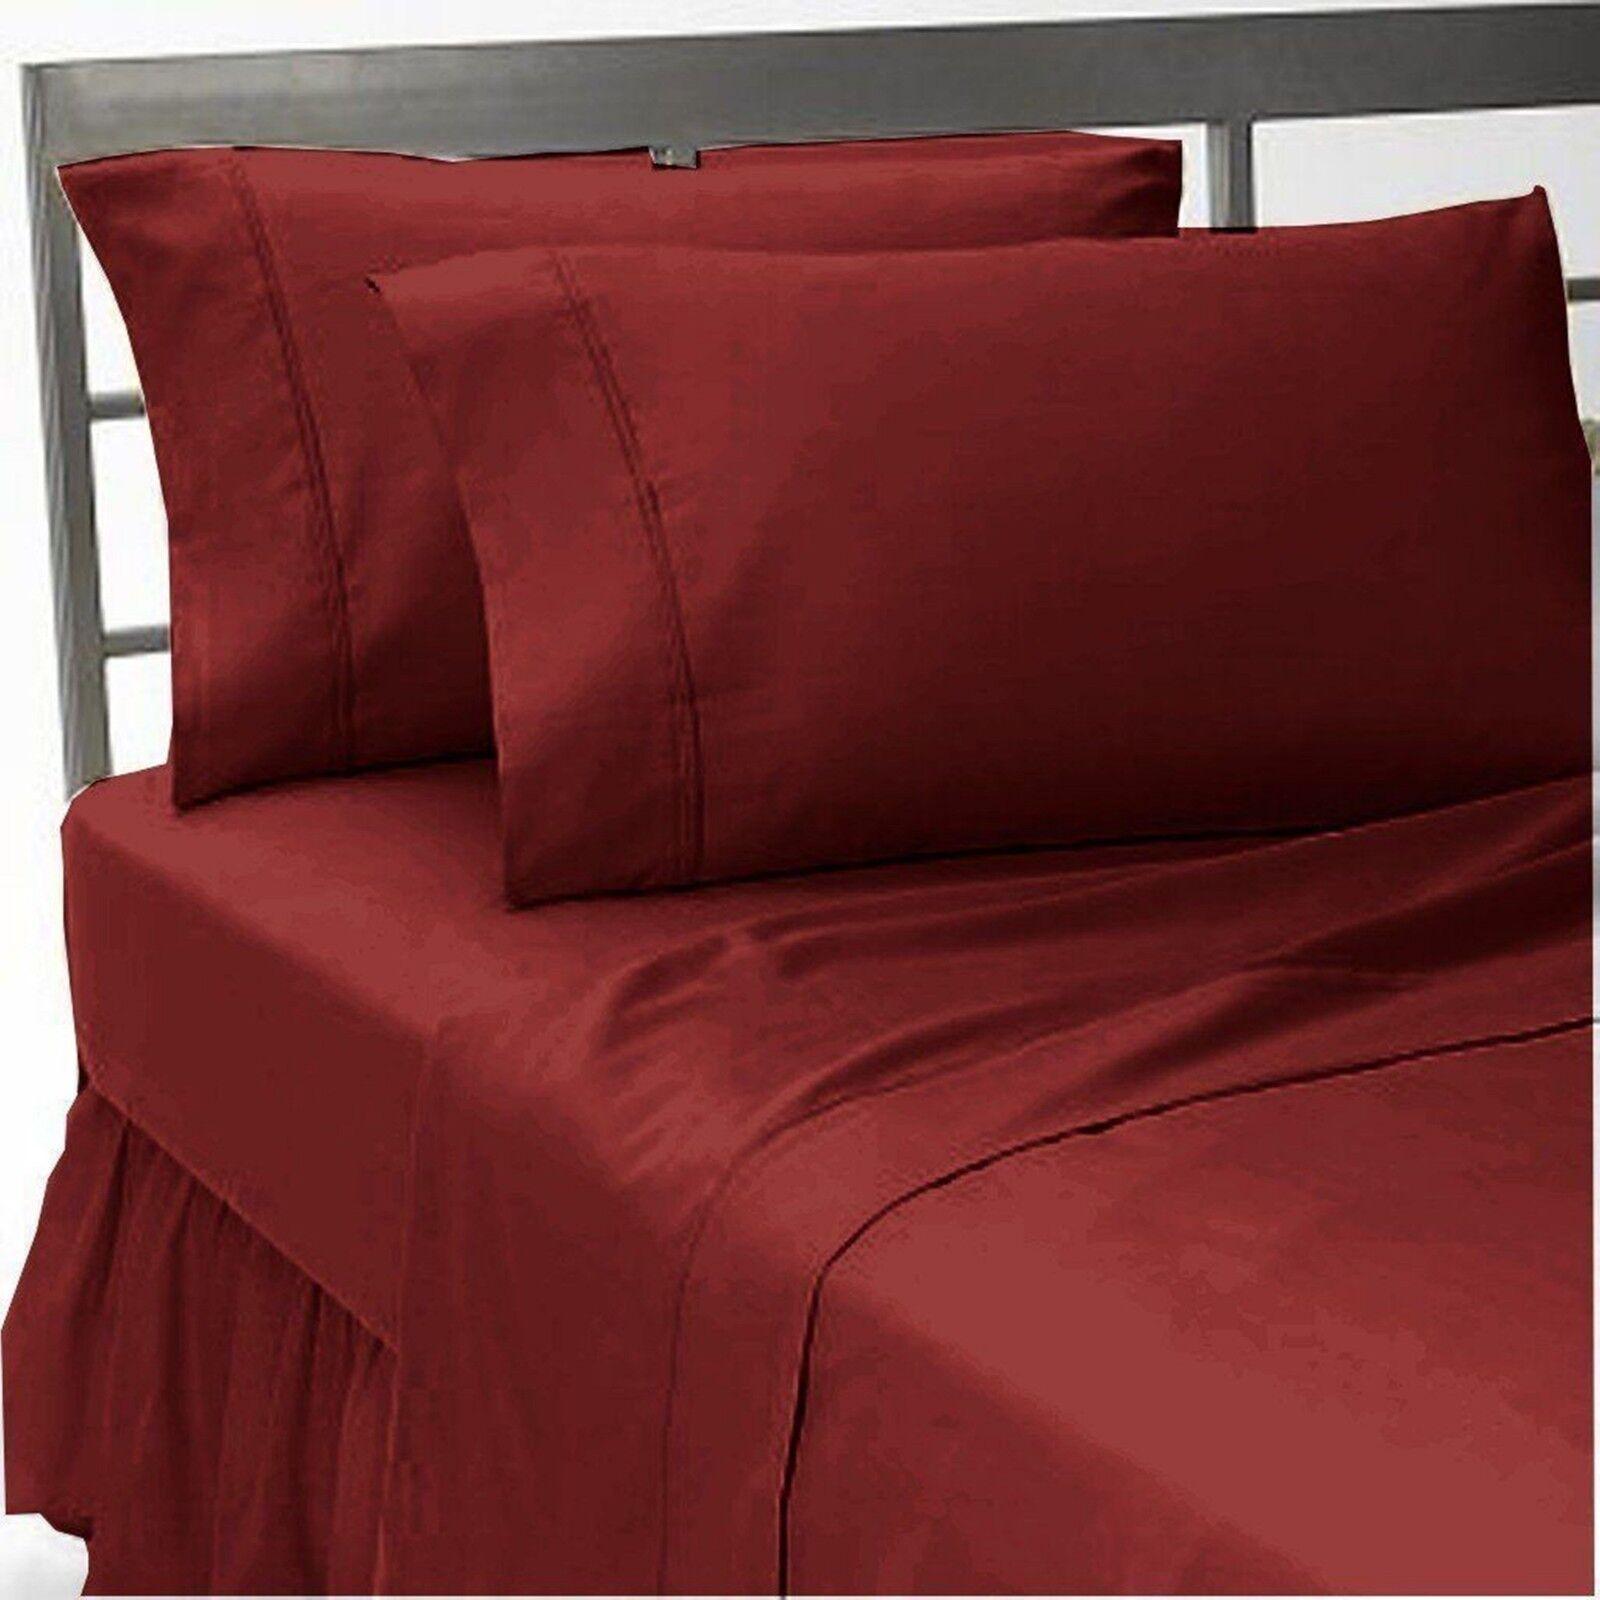 Luxurious 600 Thread-Count 100% Cotton 4 PCs Burgundy Solid Sheet Set